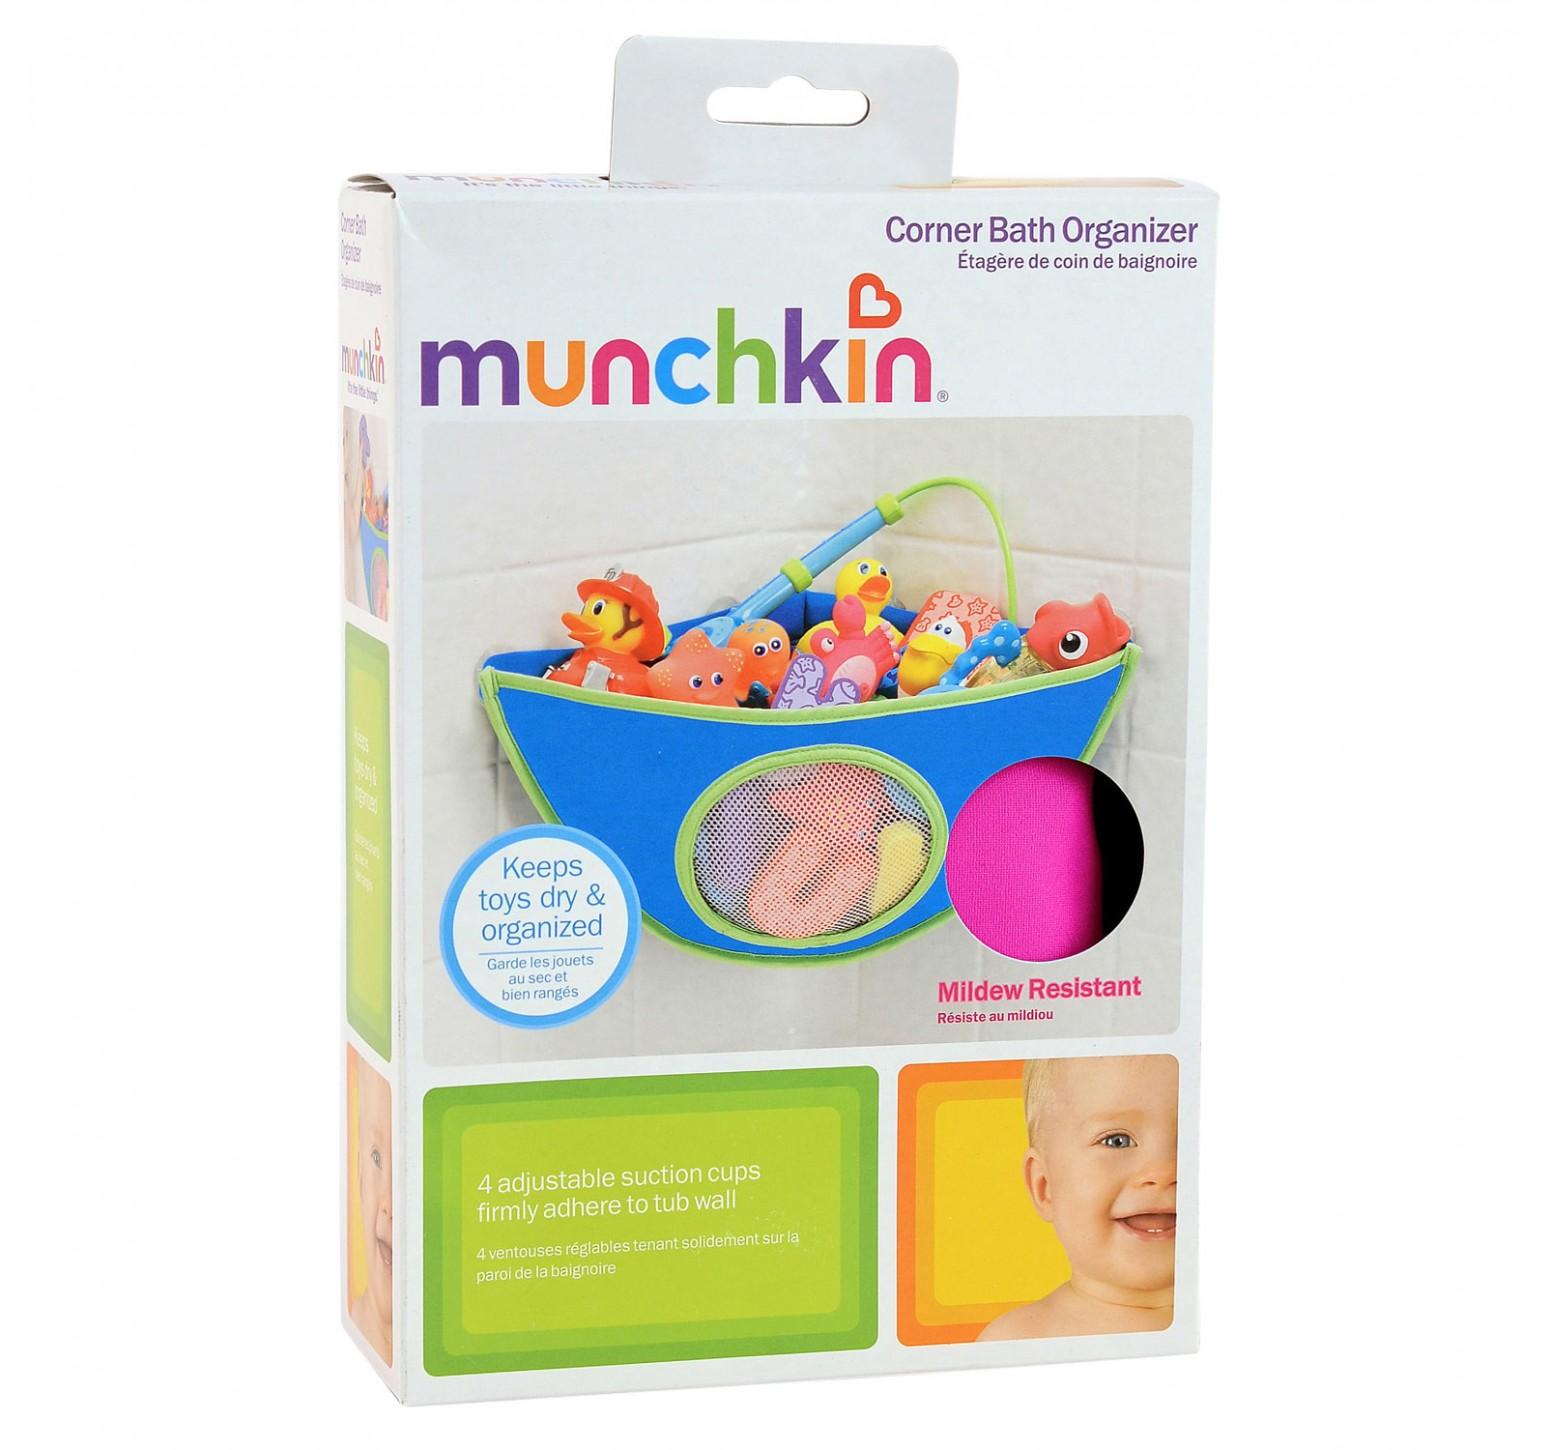 bebé: munchkin organizador esquinero para juguetes de baño, tienda ... - Organizador De Juguetes Para Bano